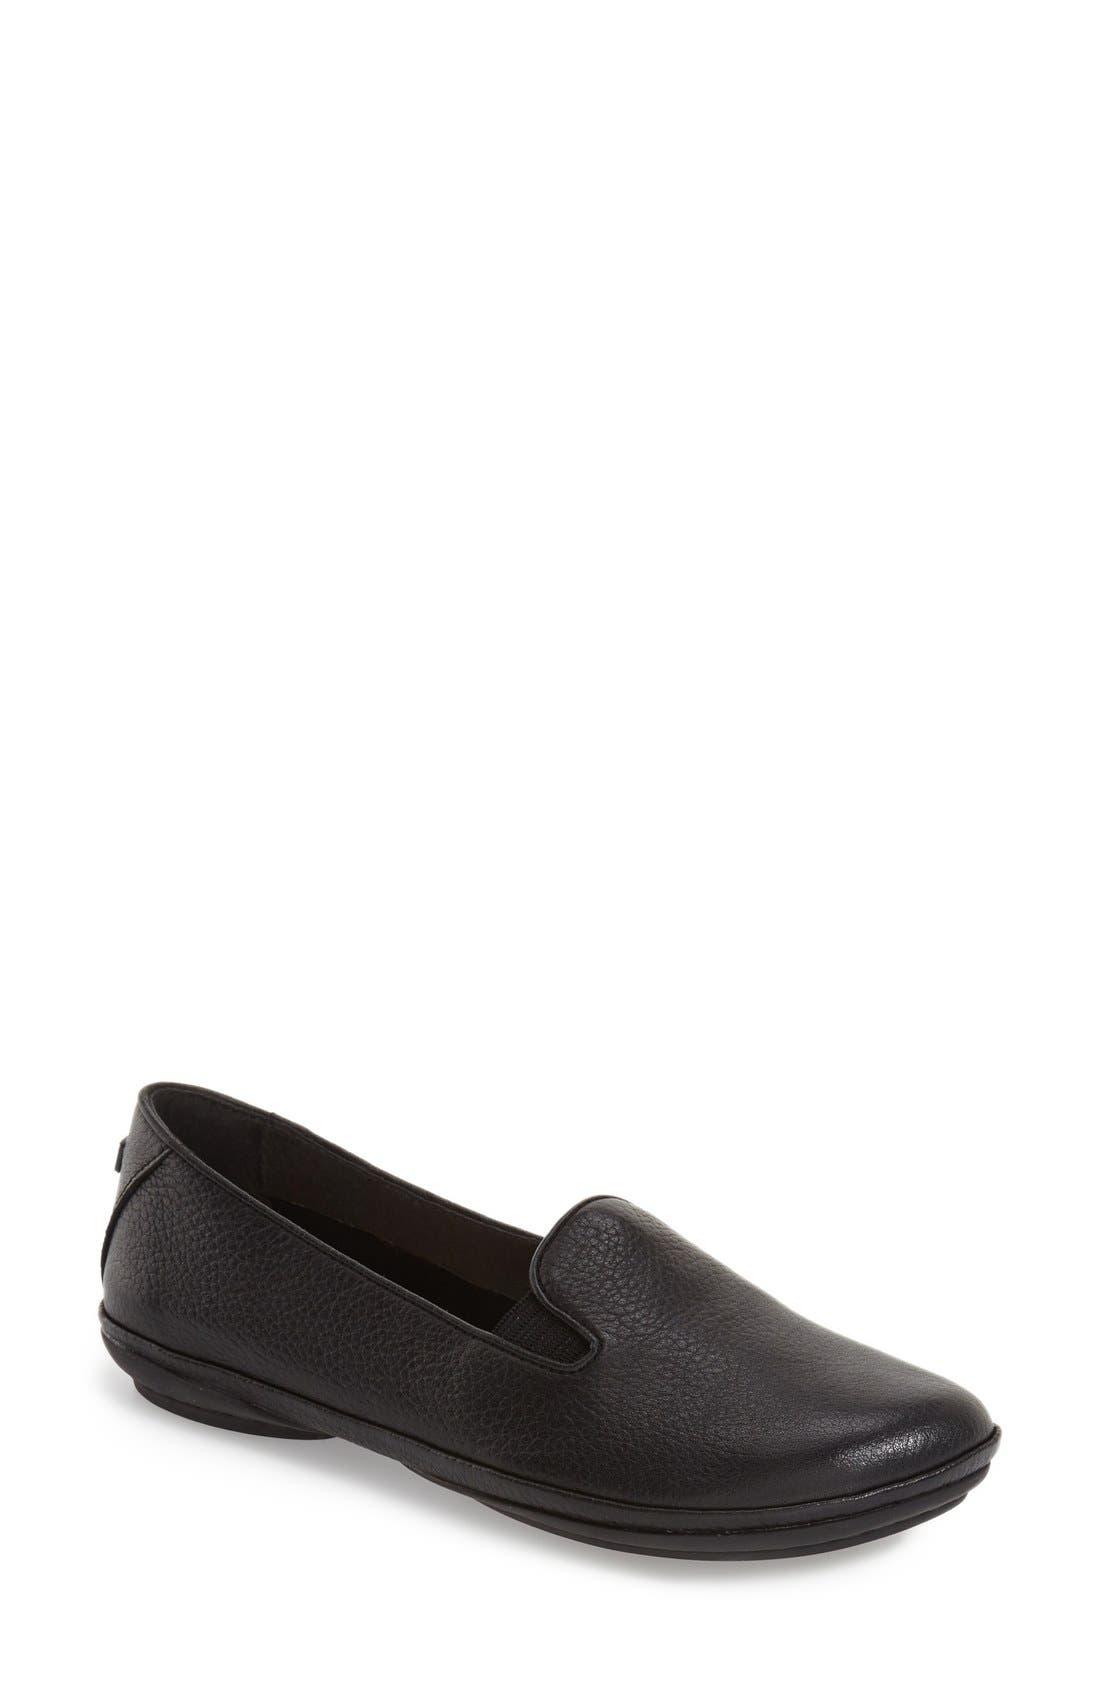 CAMPER, 'Right Nina' Leather Flat, Main thumbnail 1, color, BLACK/ BLACK LEATHER